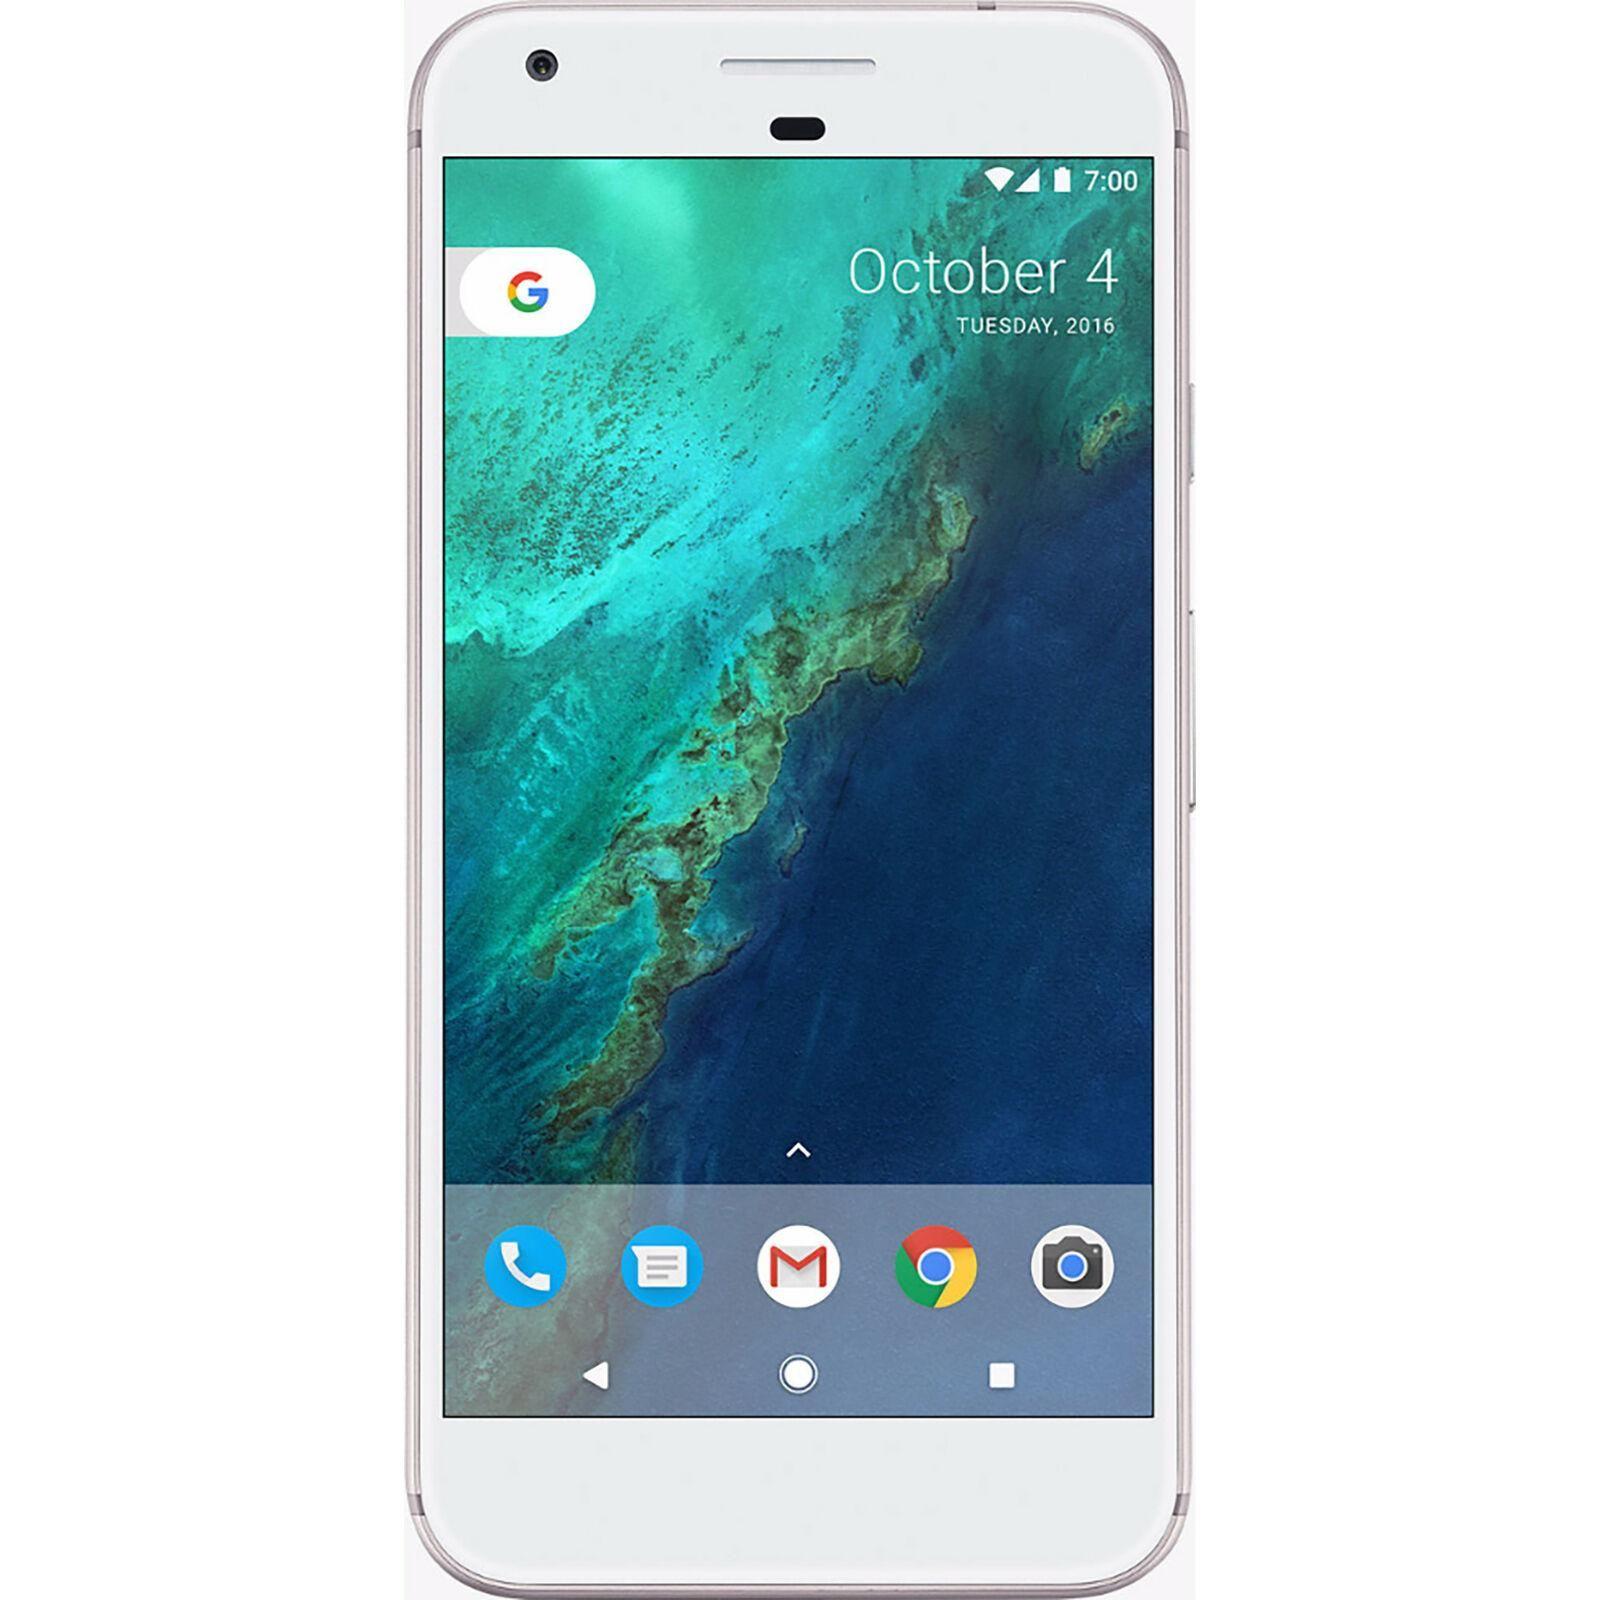 At T Google Pixel 128gb Refurbished In 2020 Google Pixel Phone Google Pixel Xl Pixel Xl Phone